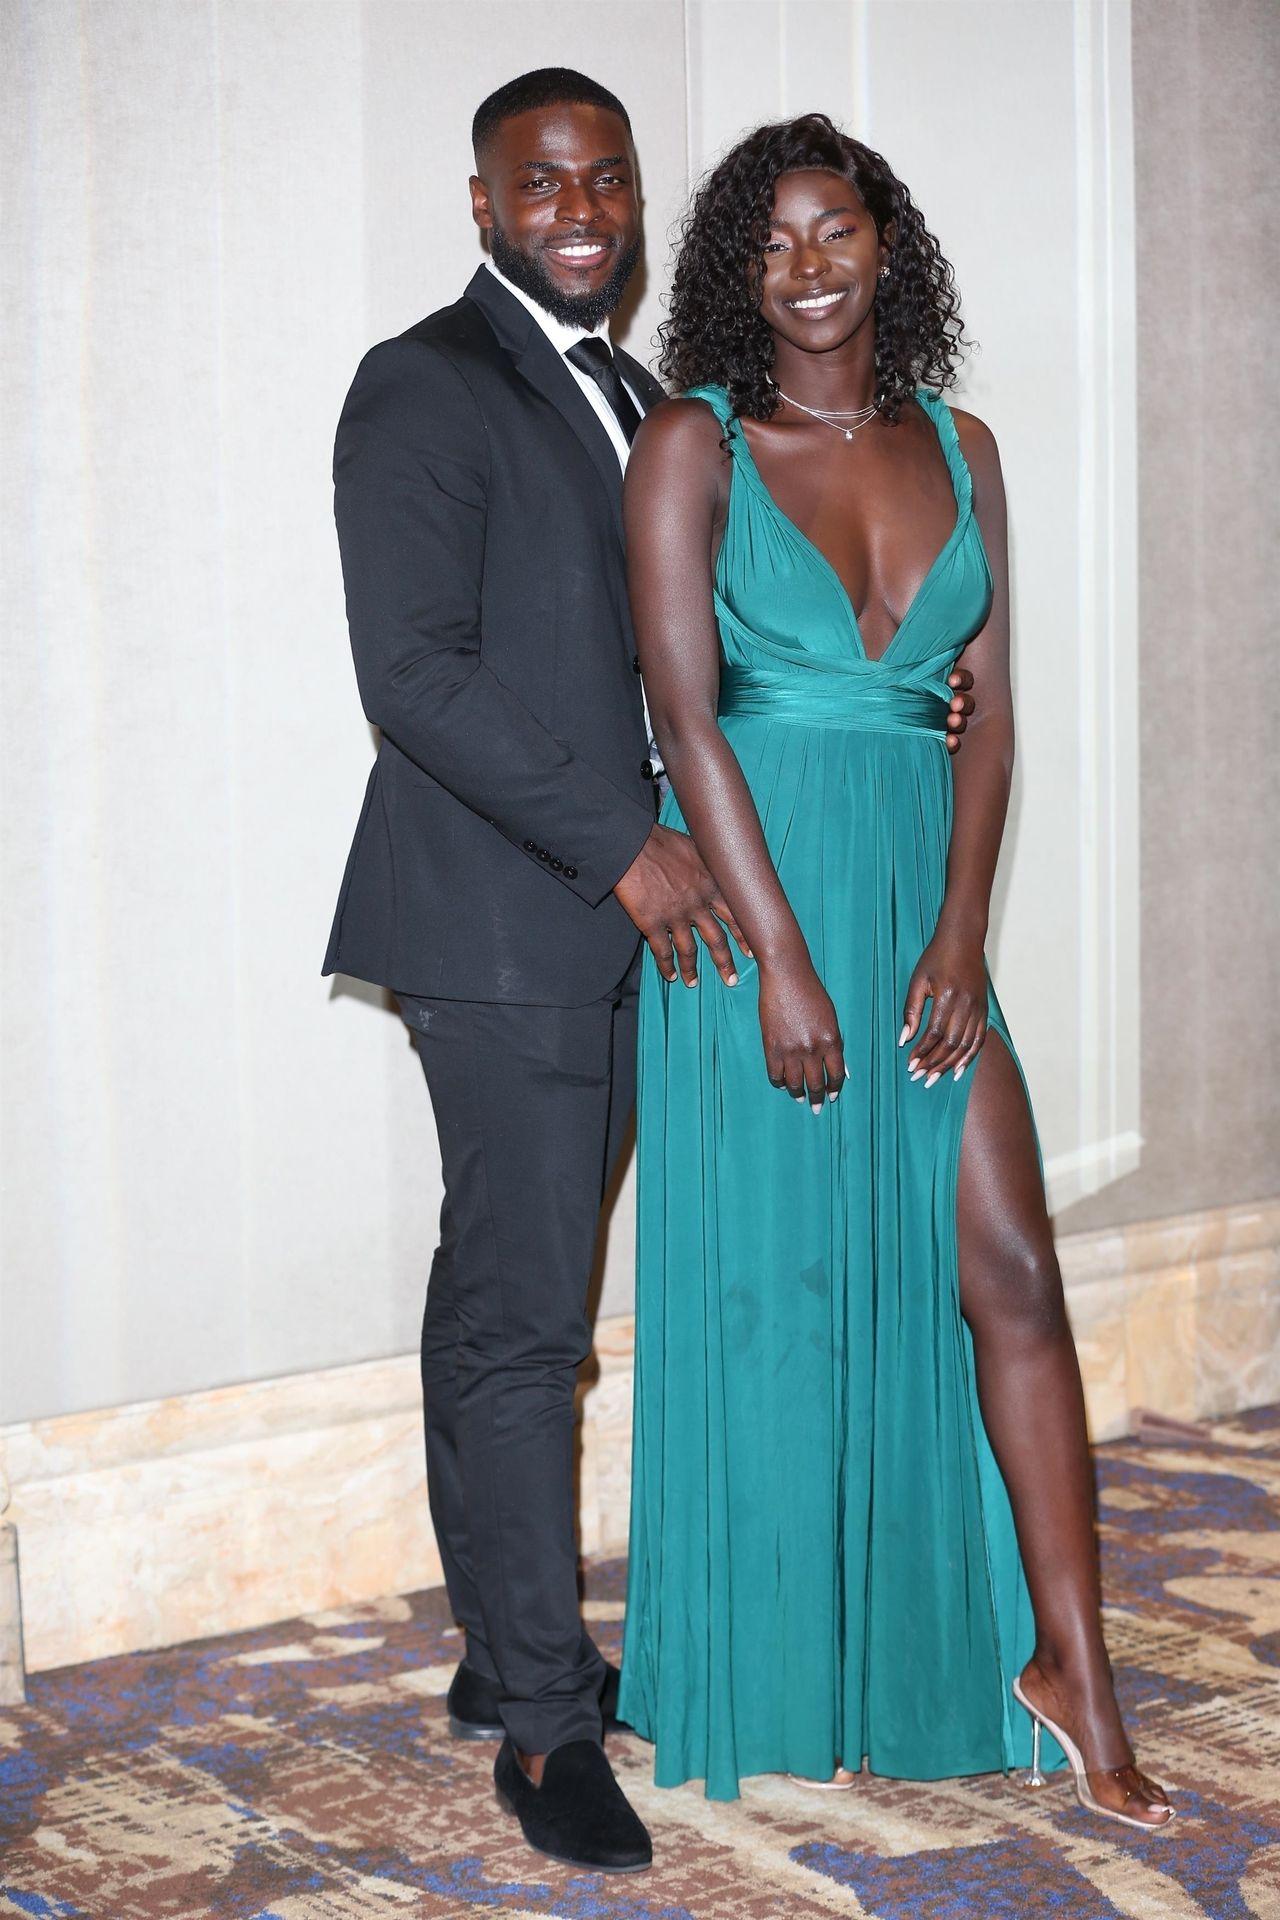 Mike Boateng & Priscilla Anyabu Are Seen At British Ethnic Diversity Sports Awards 0137